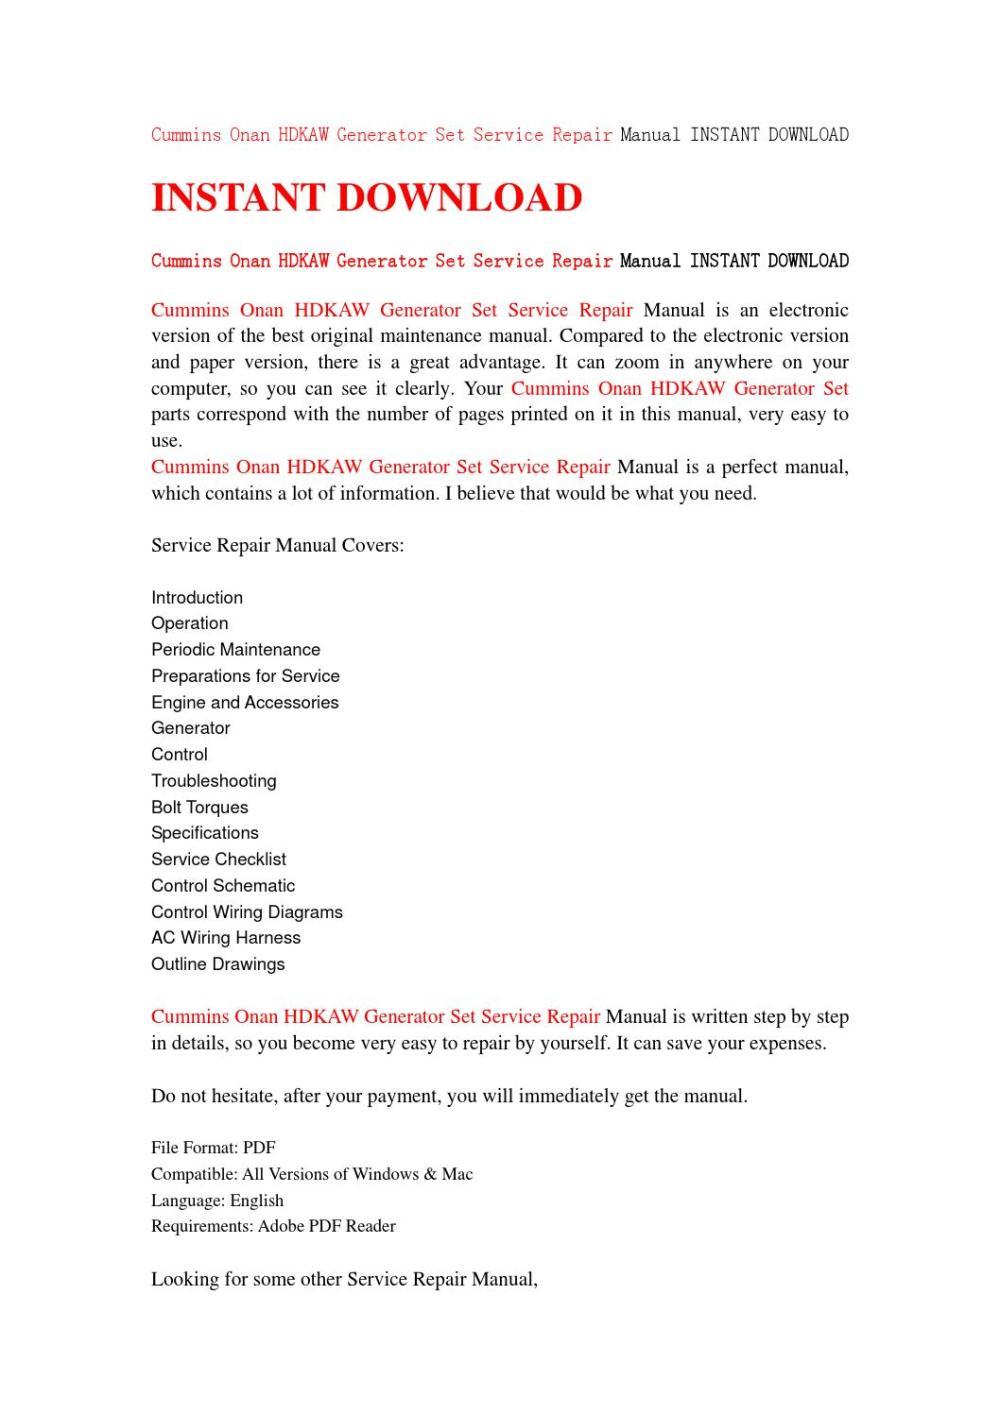 medium resolution of cummins onan hdkaw generator set service repair manual instant download by jhsefjn7 issuu